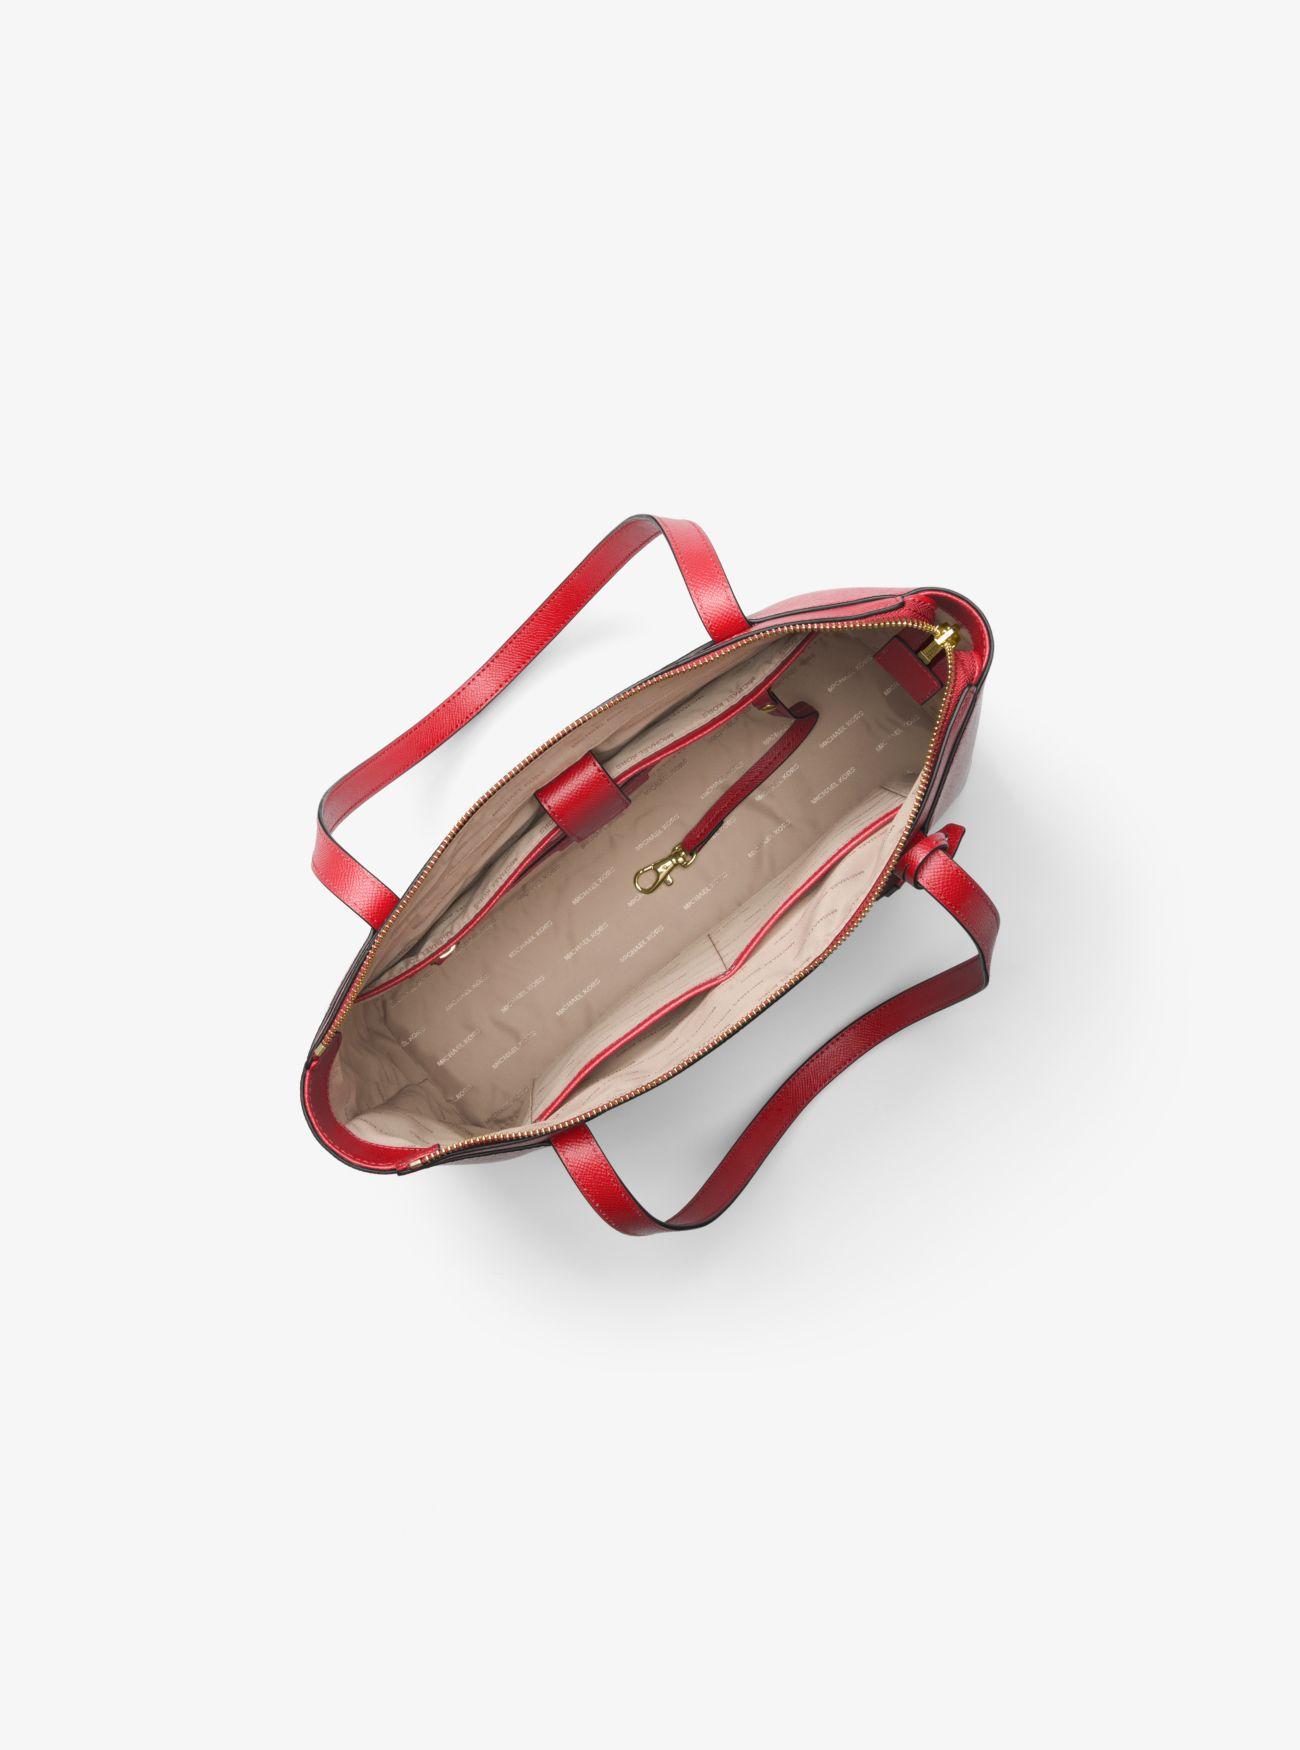 3e3dd093819e Maddie Medium Crossgrain Leather Tote Bag Maddie Medium Crossgrain Leather  Tote Bag Maddie Medium Crossgrain Leather Tote Bag. MICHAEL Michael Kors